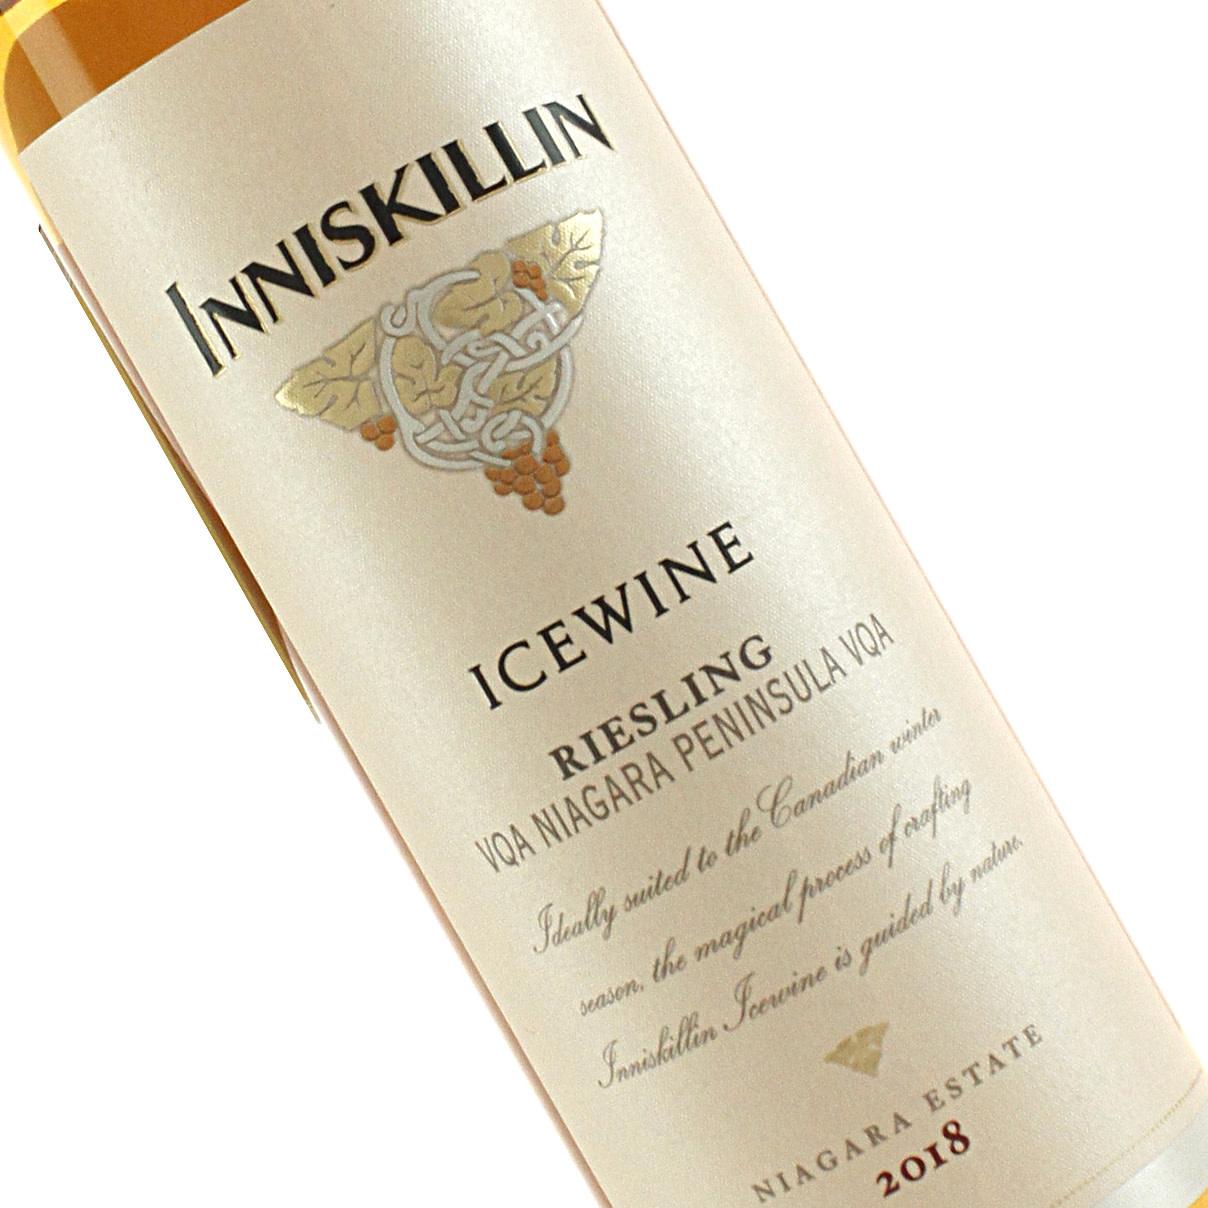 Inniskillin 2018 Riesling Icewine, Niagara Peninsula, Canada, half bottle